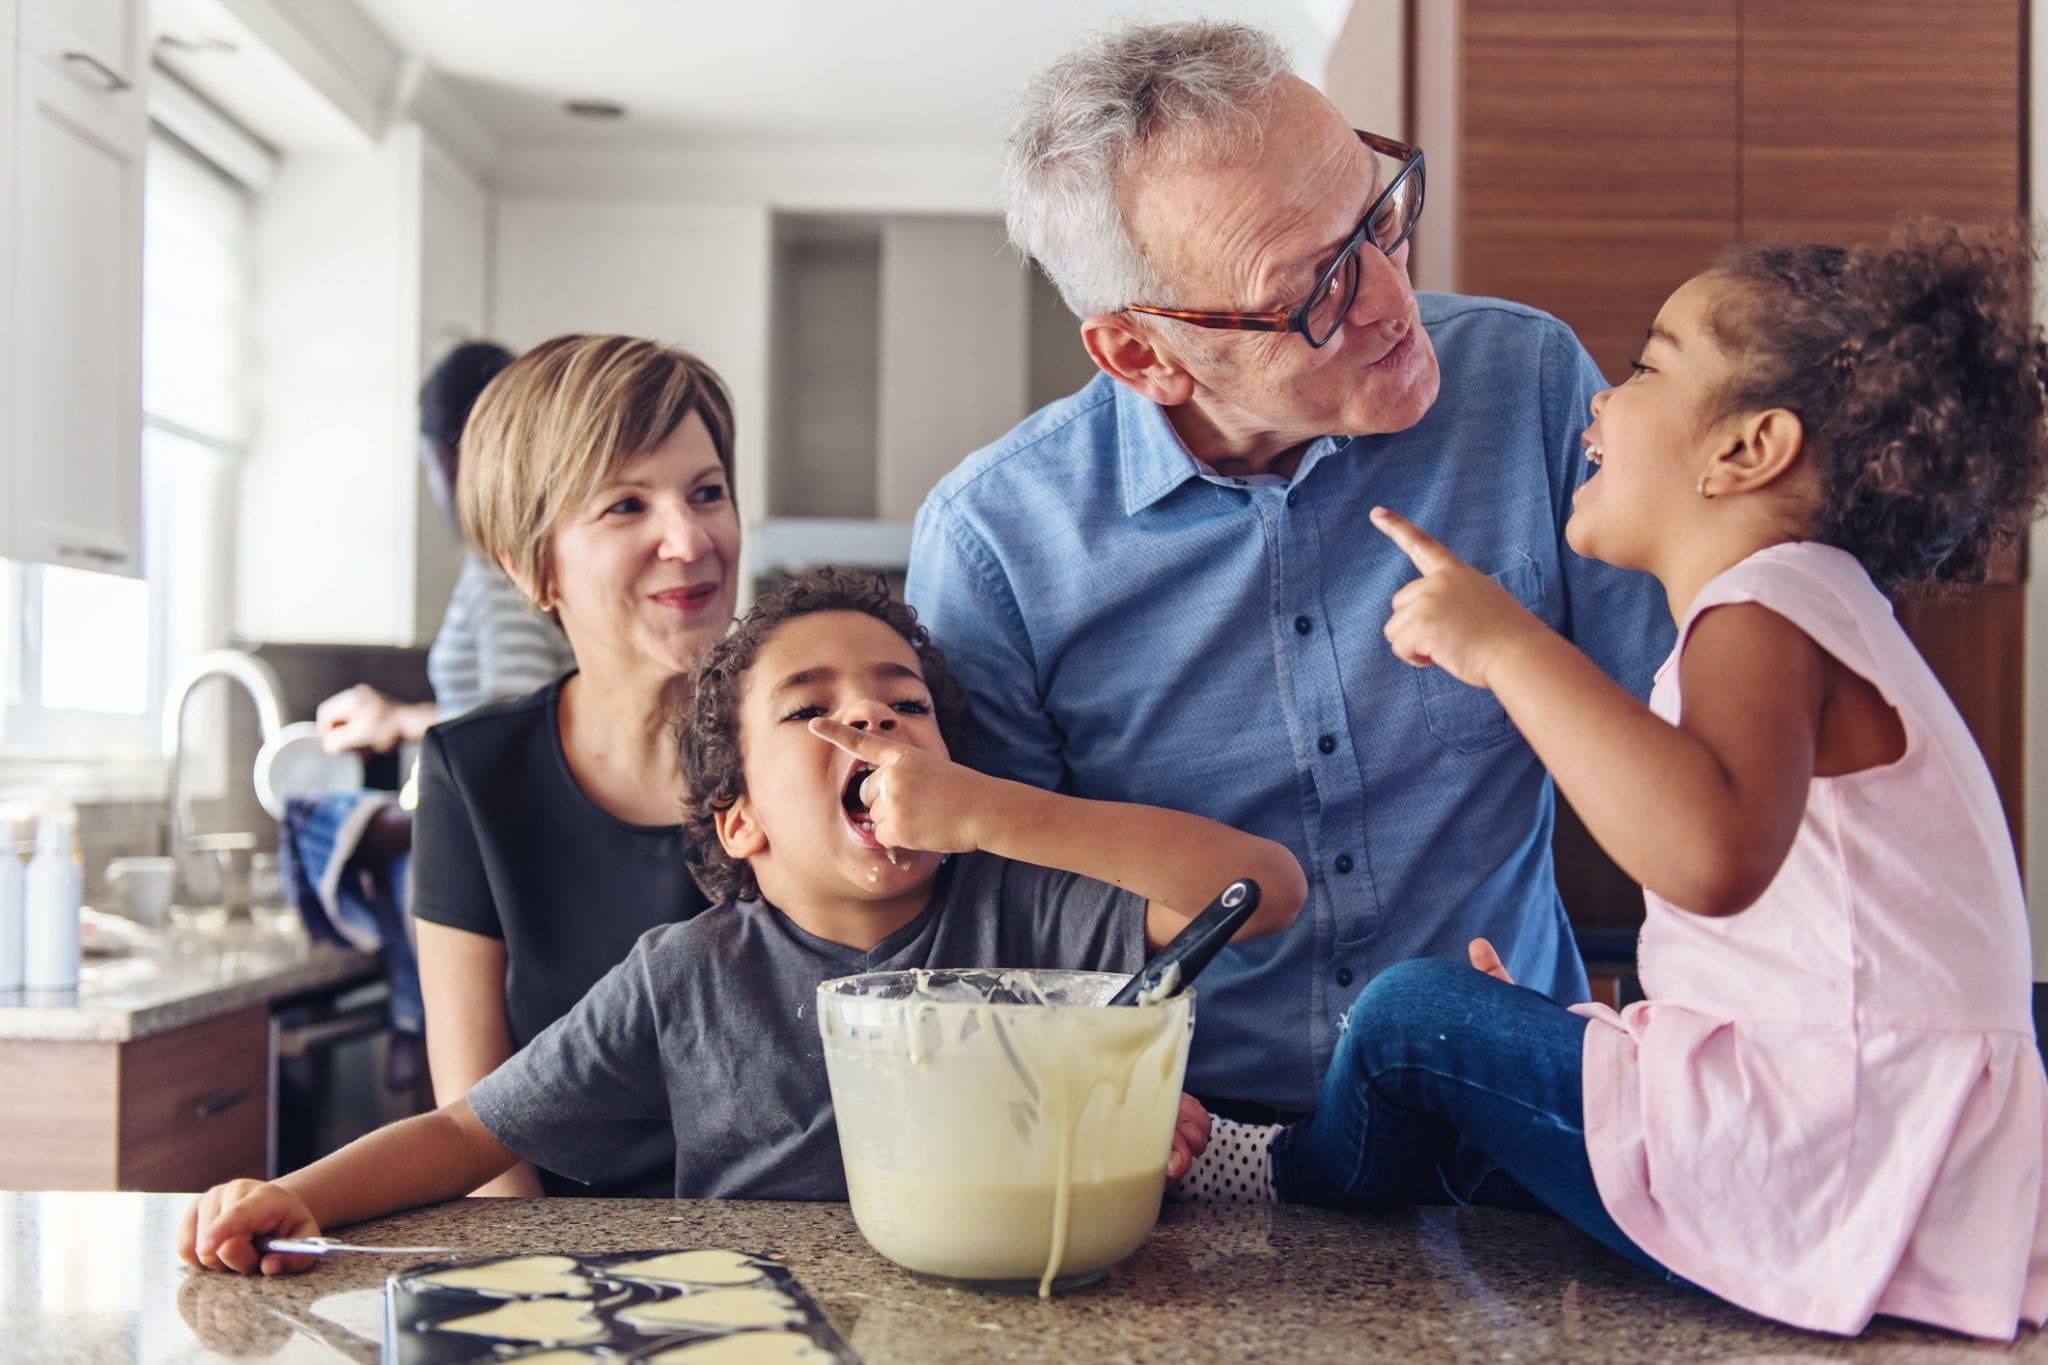 The Benefits of the Grandparent-Grandchild Relationship